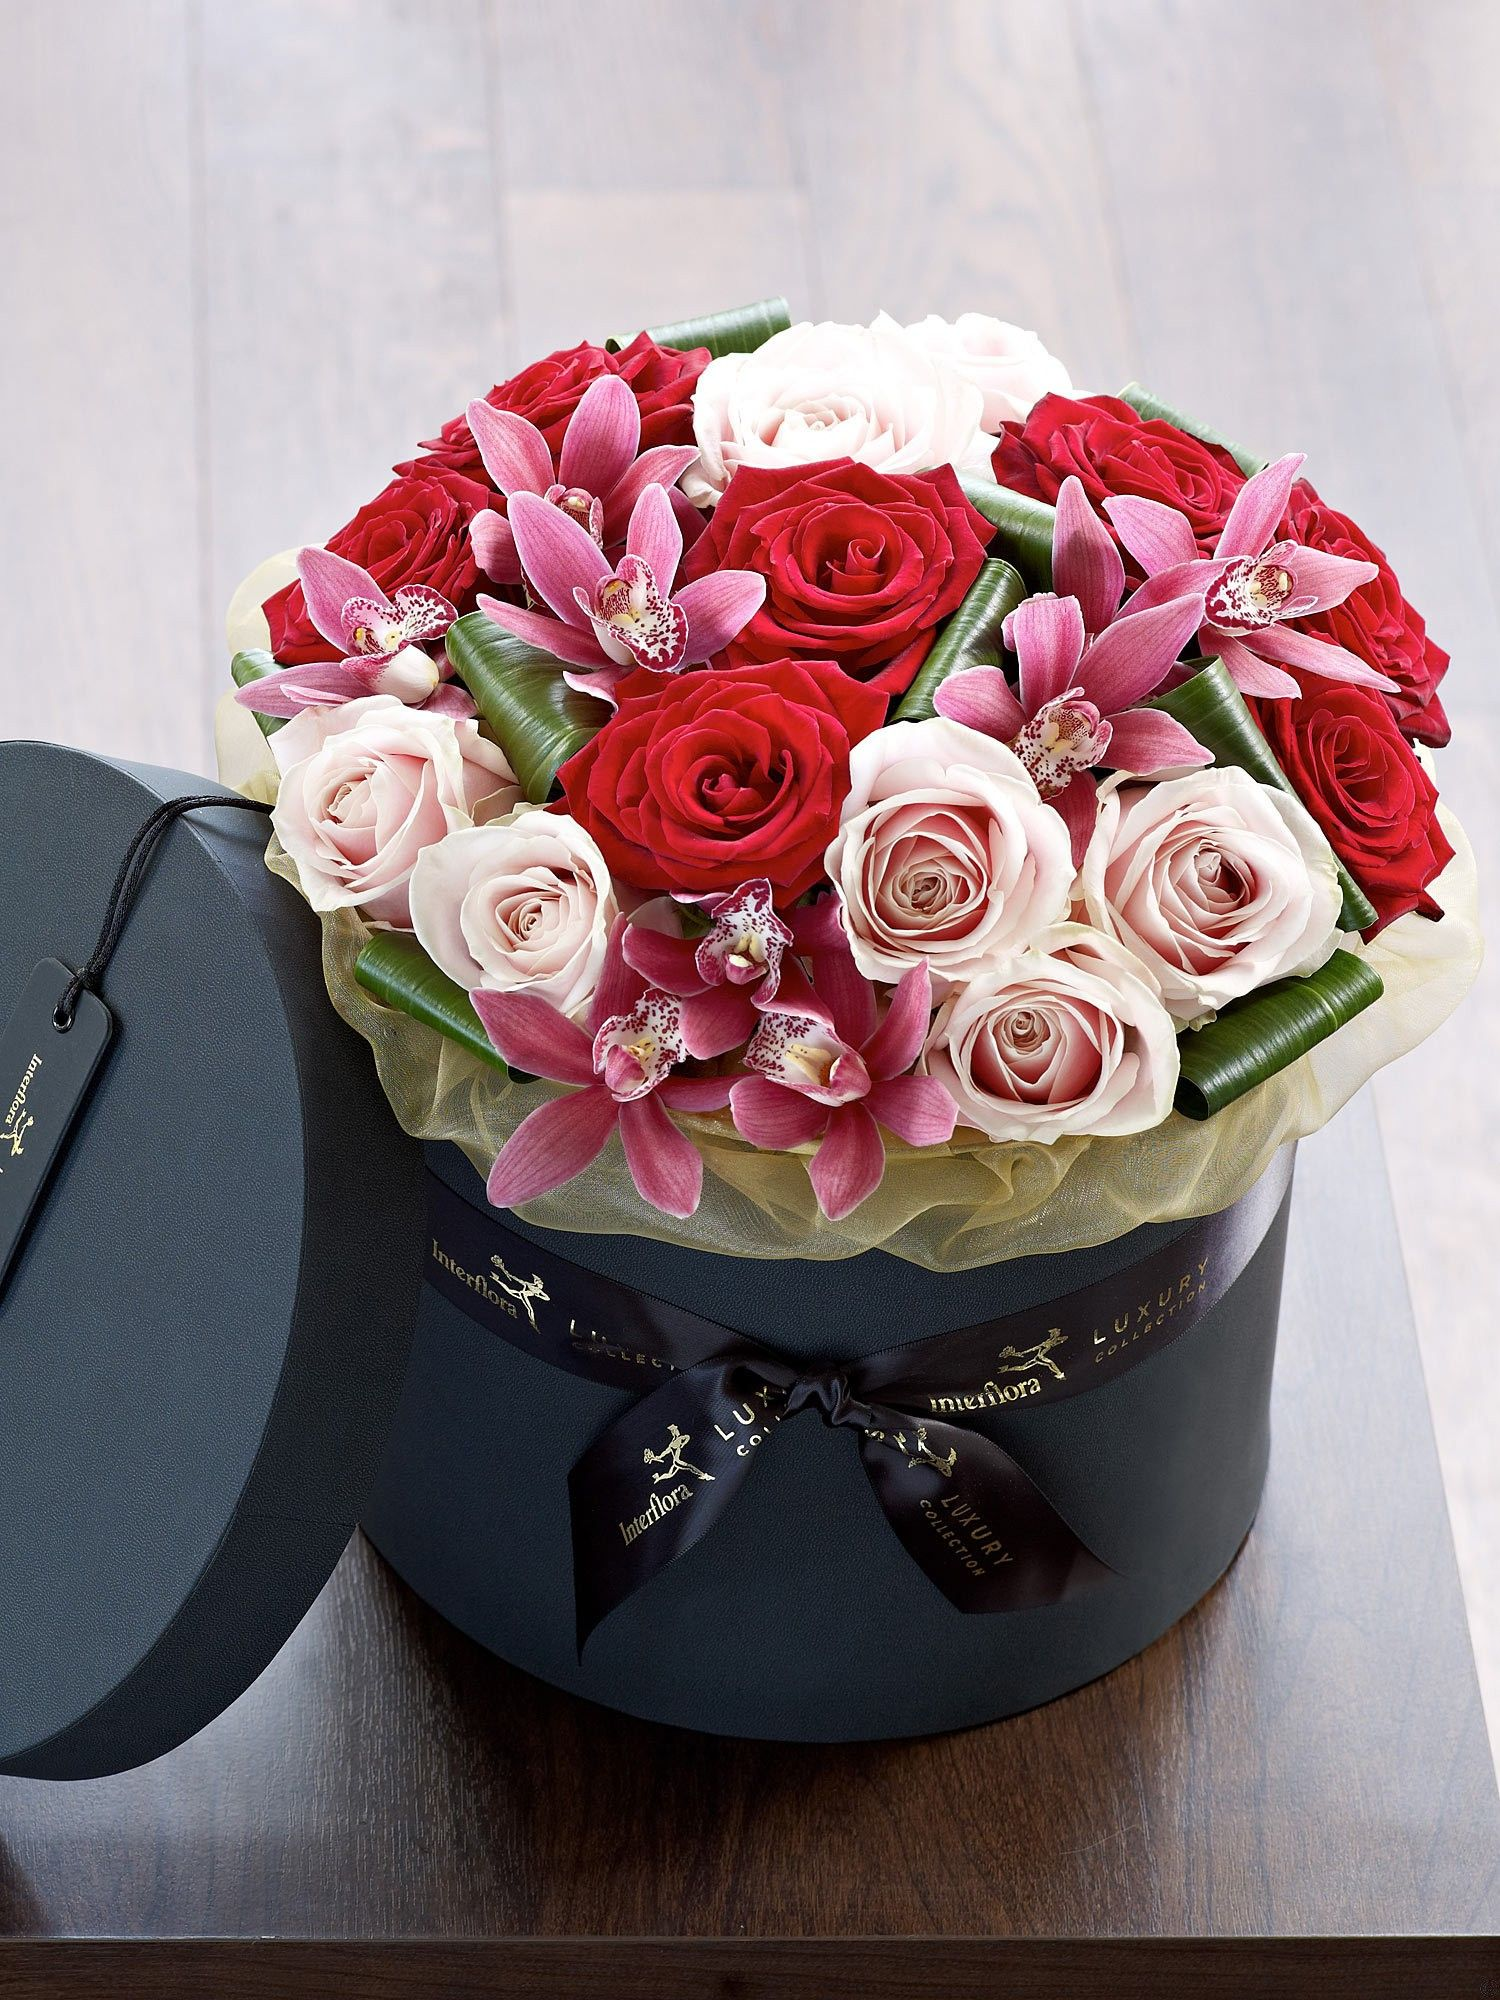 Luxury rose and cymbidium orchid hatbox paris je taime luxury rose and cymbidium orchid hatbox izmirmasajfo Choice Image